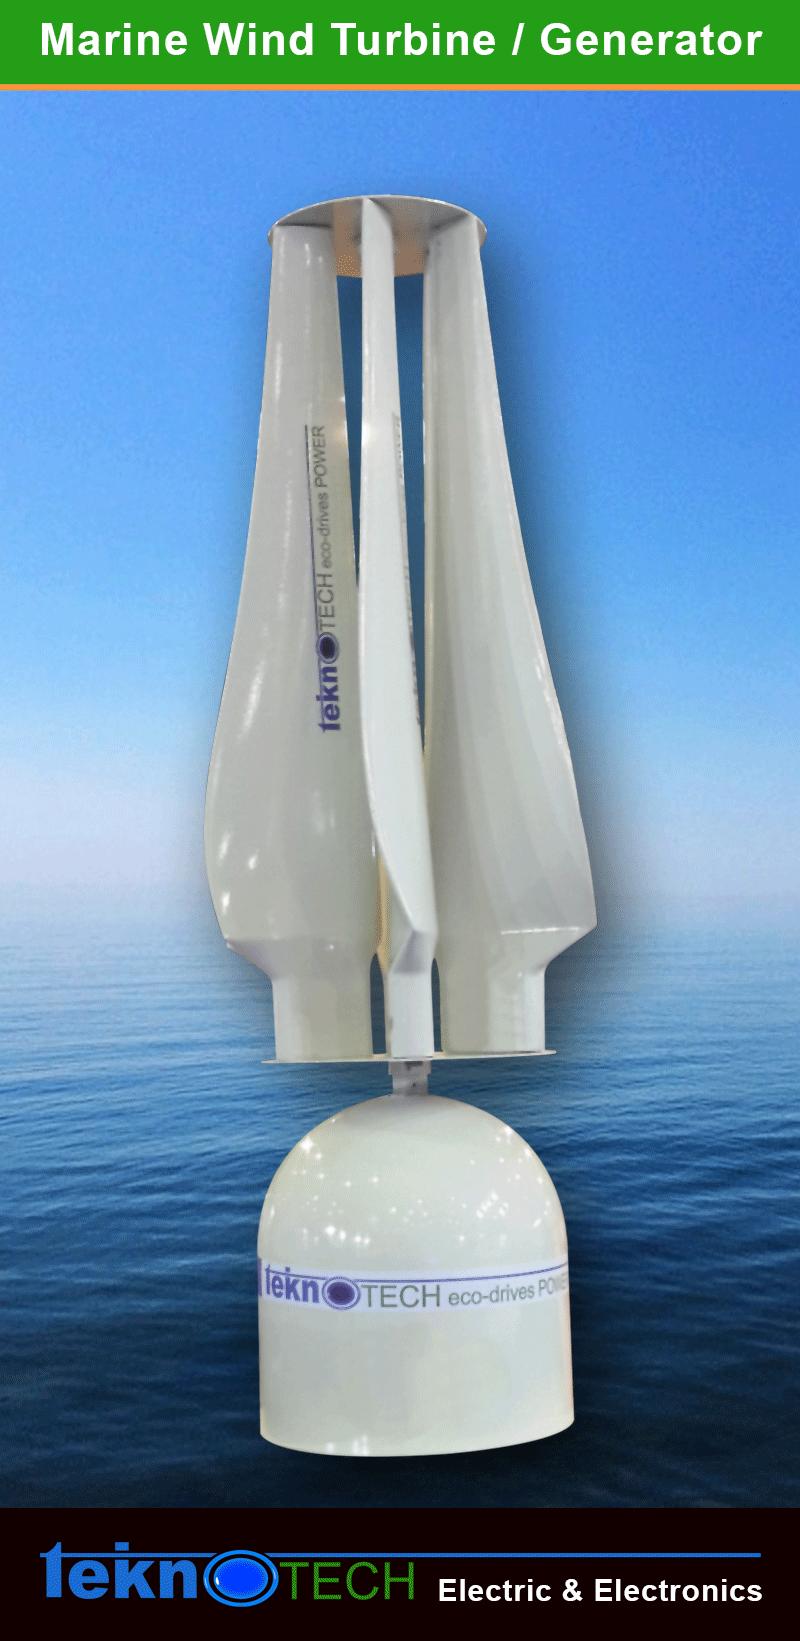 Elektrikli tekne, teknotech marin teknolojileri, tekne rüzgar türbini, dikey rüzgar türbini